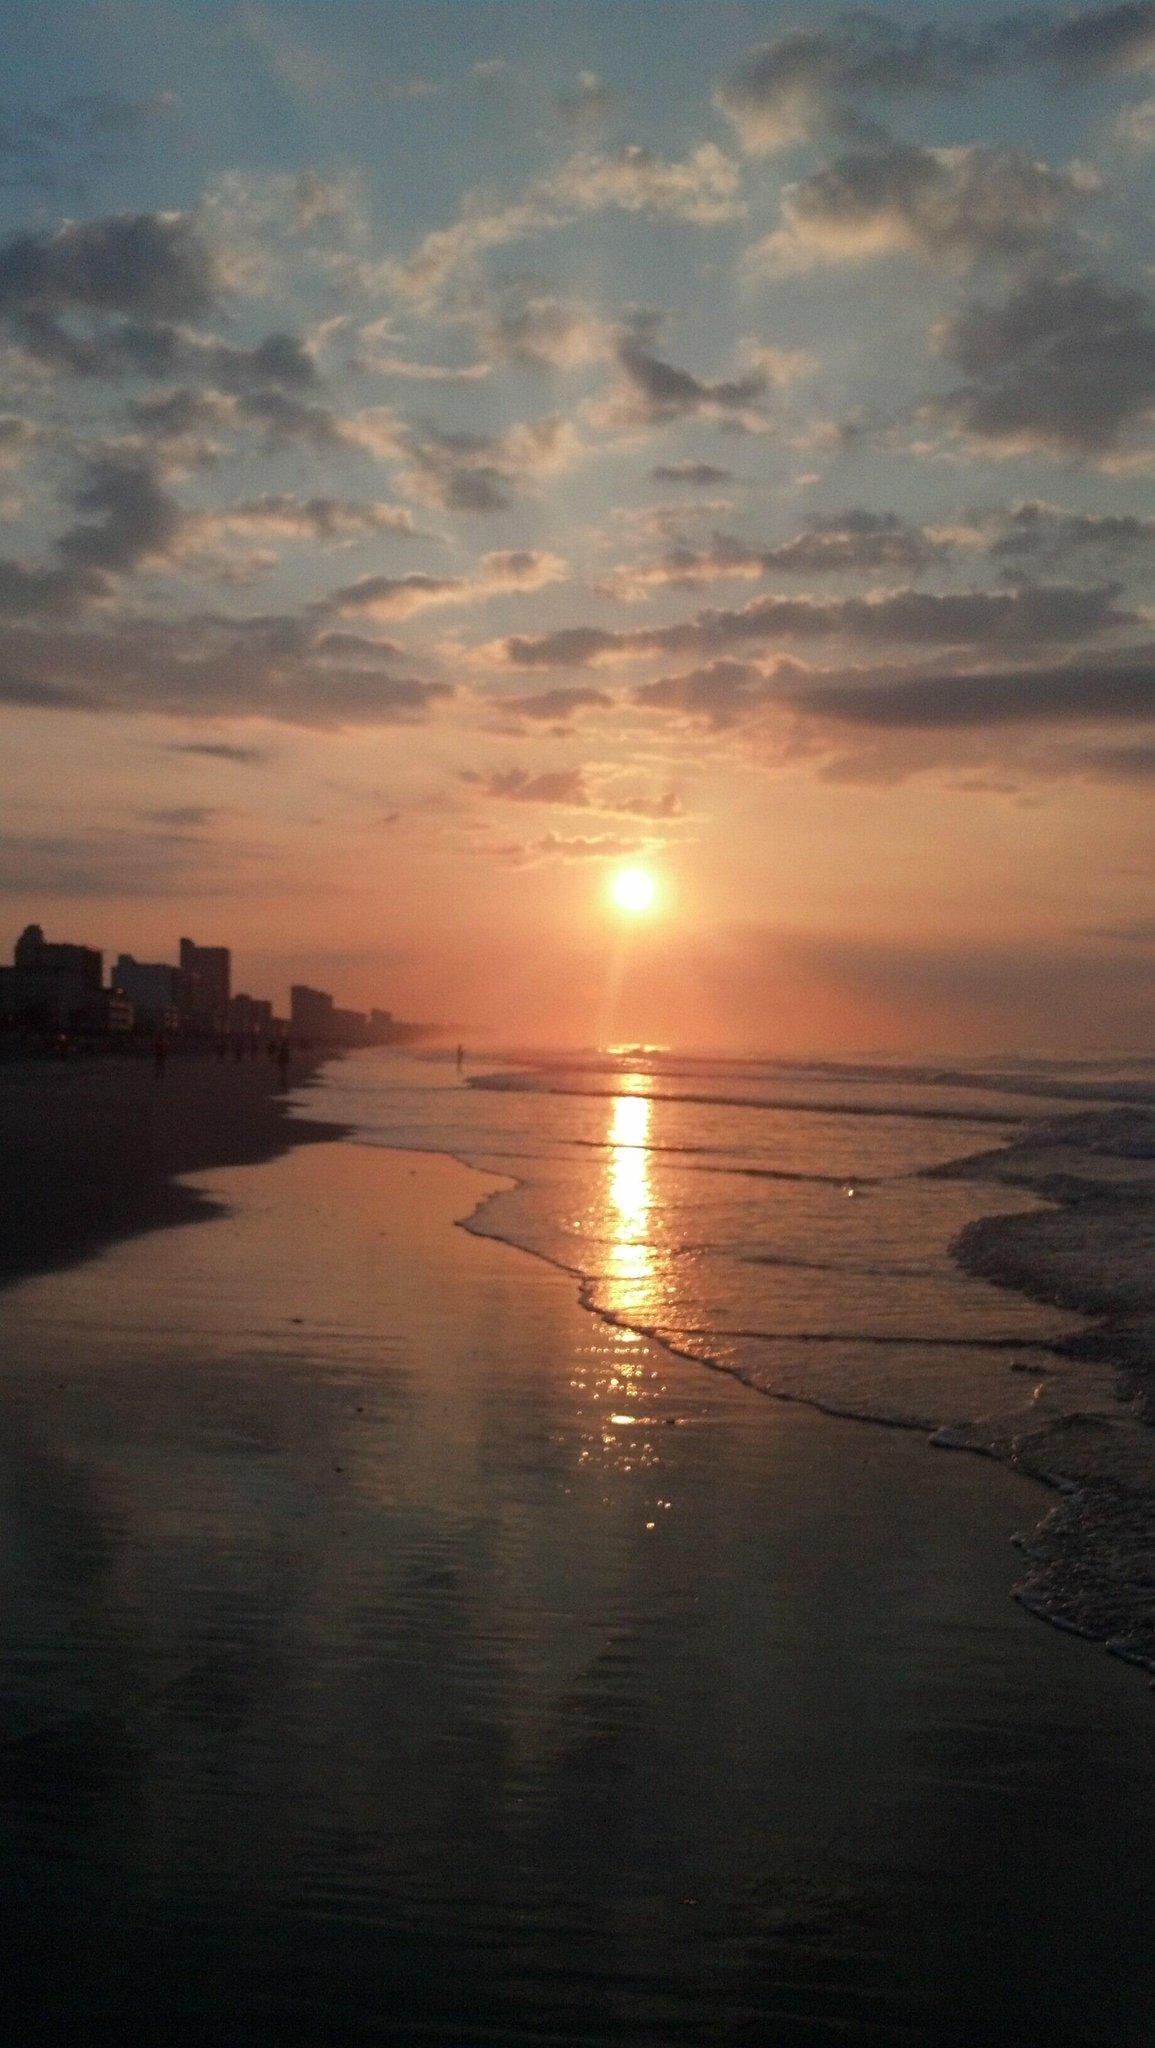 RT @RKavcar: @lonelyplanet myrtle beach http://t.co/3rZ6hN5ejA